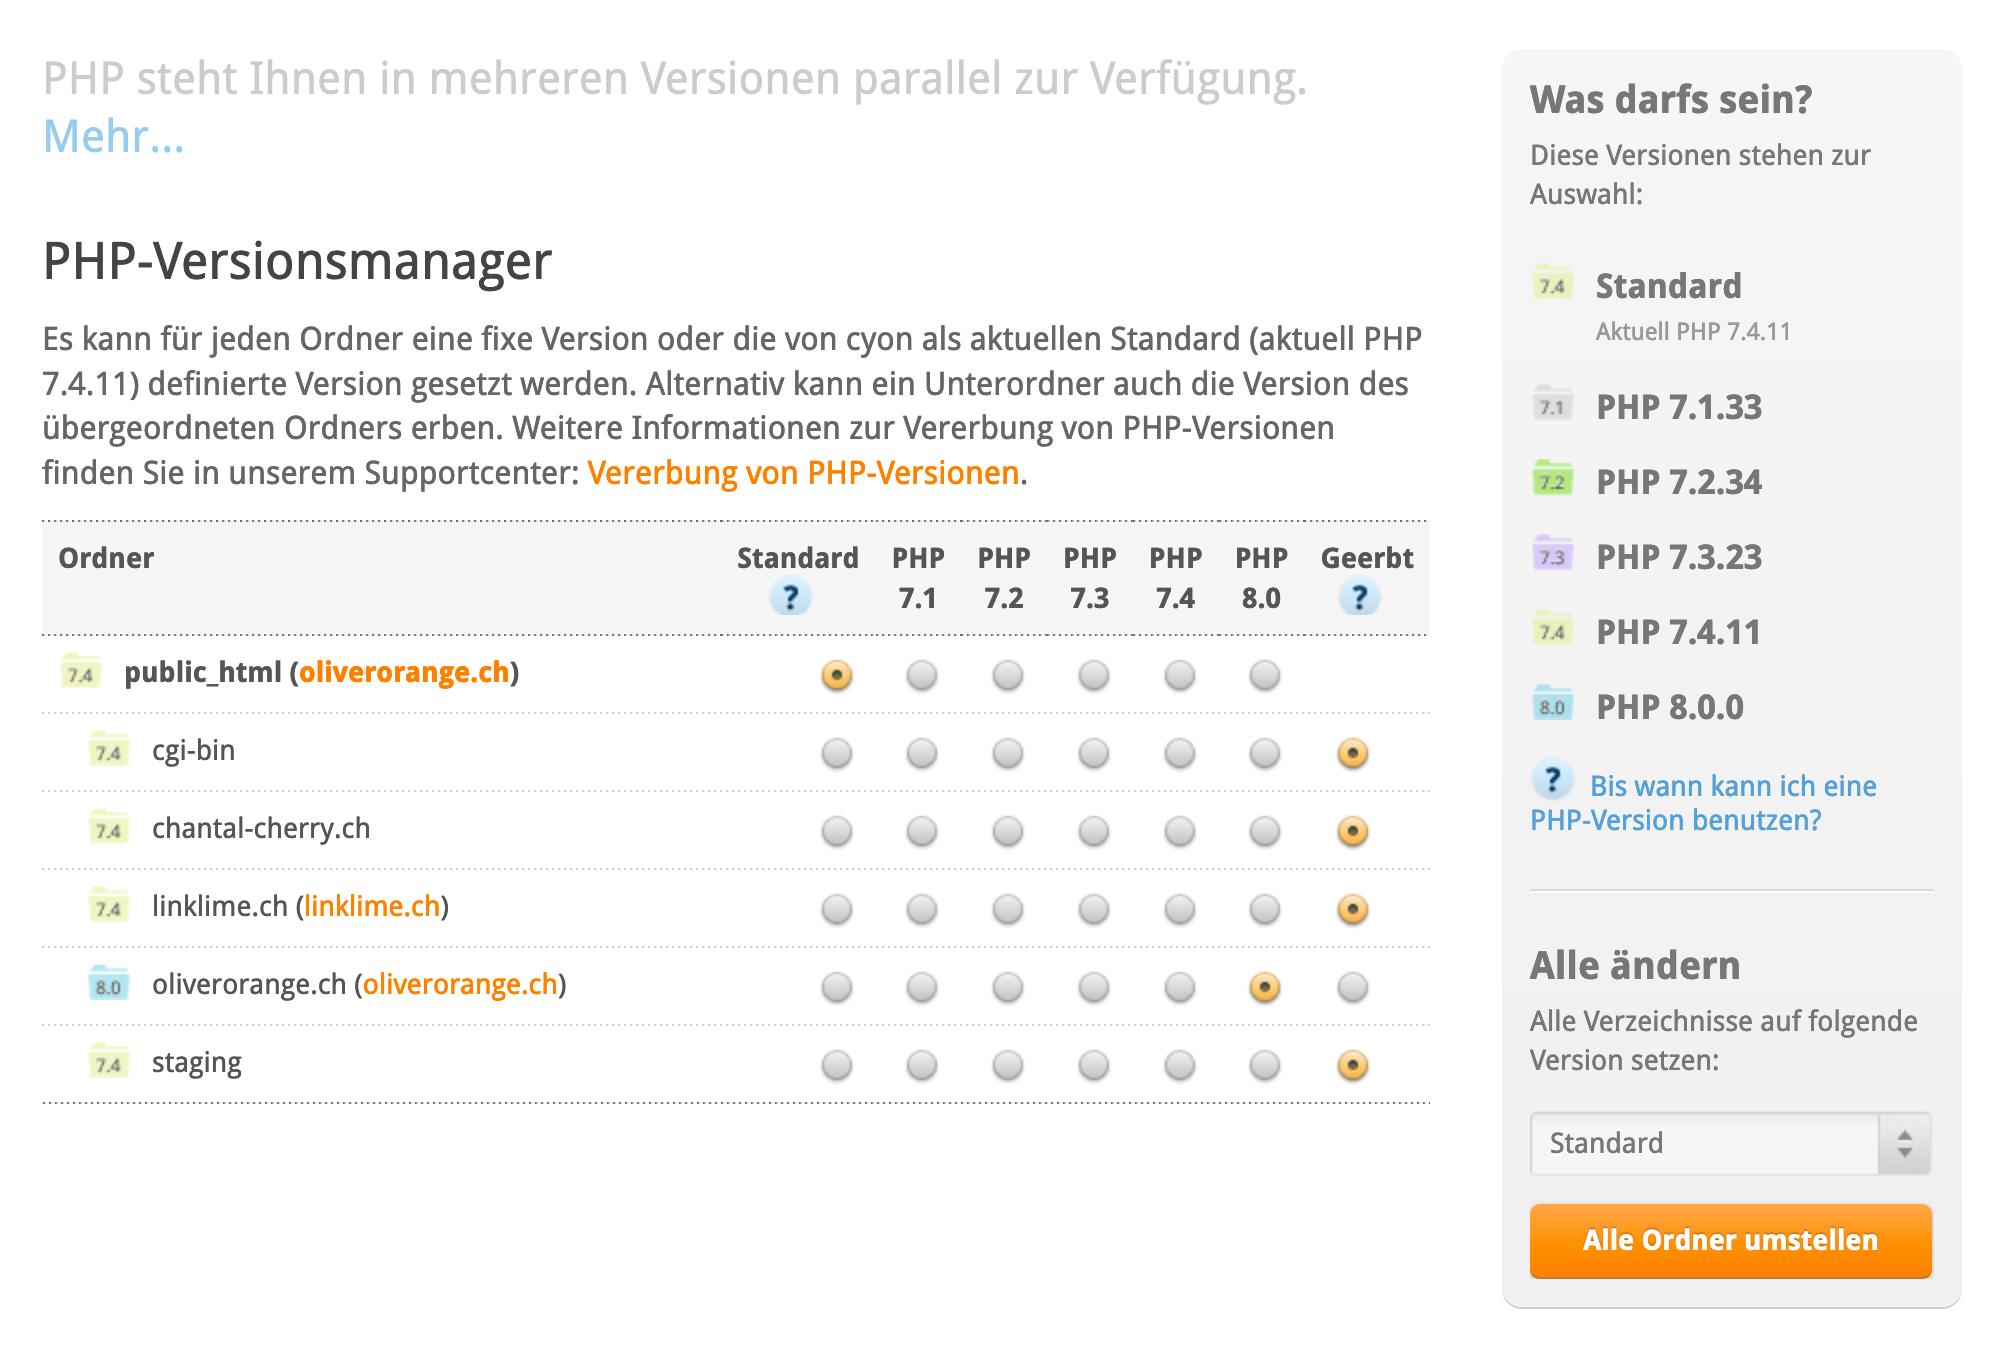 PHP-Versionsmanager im my.cyon